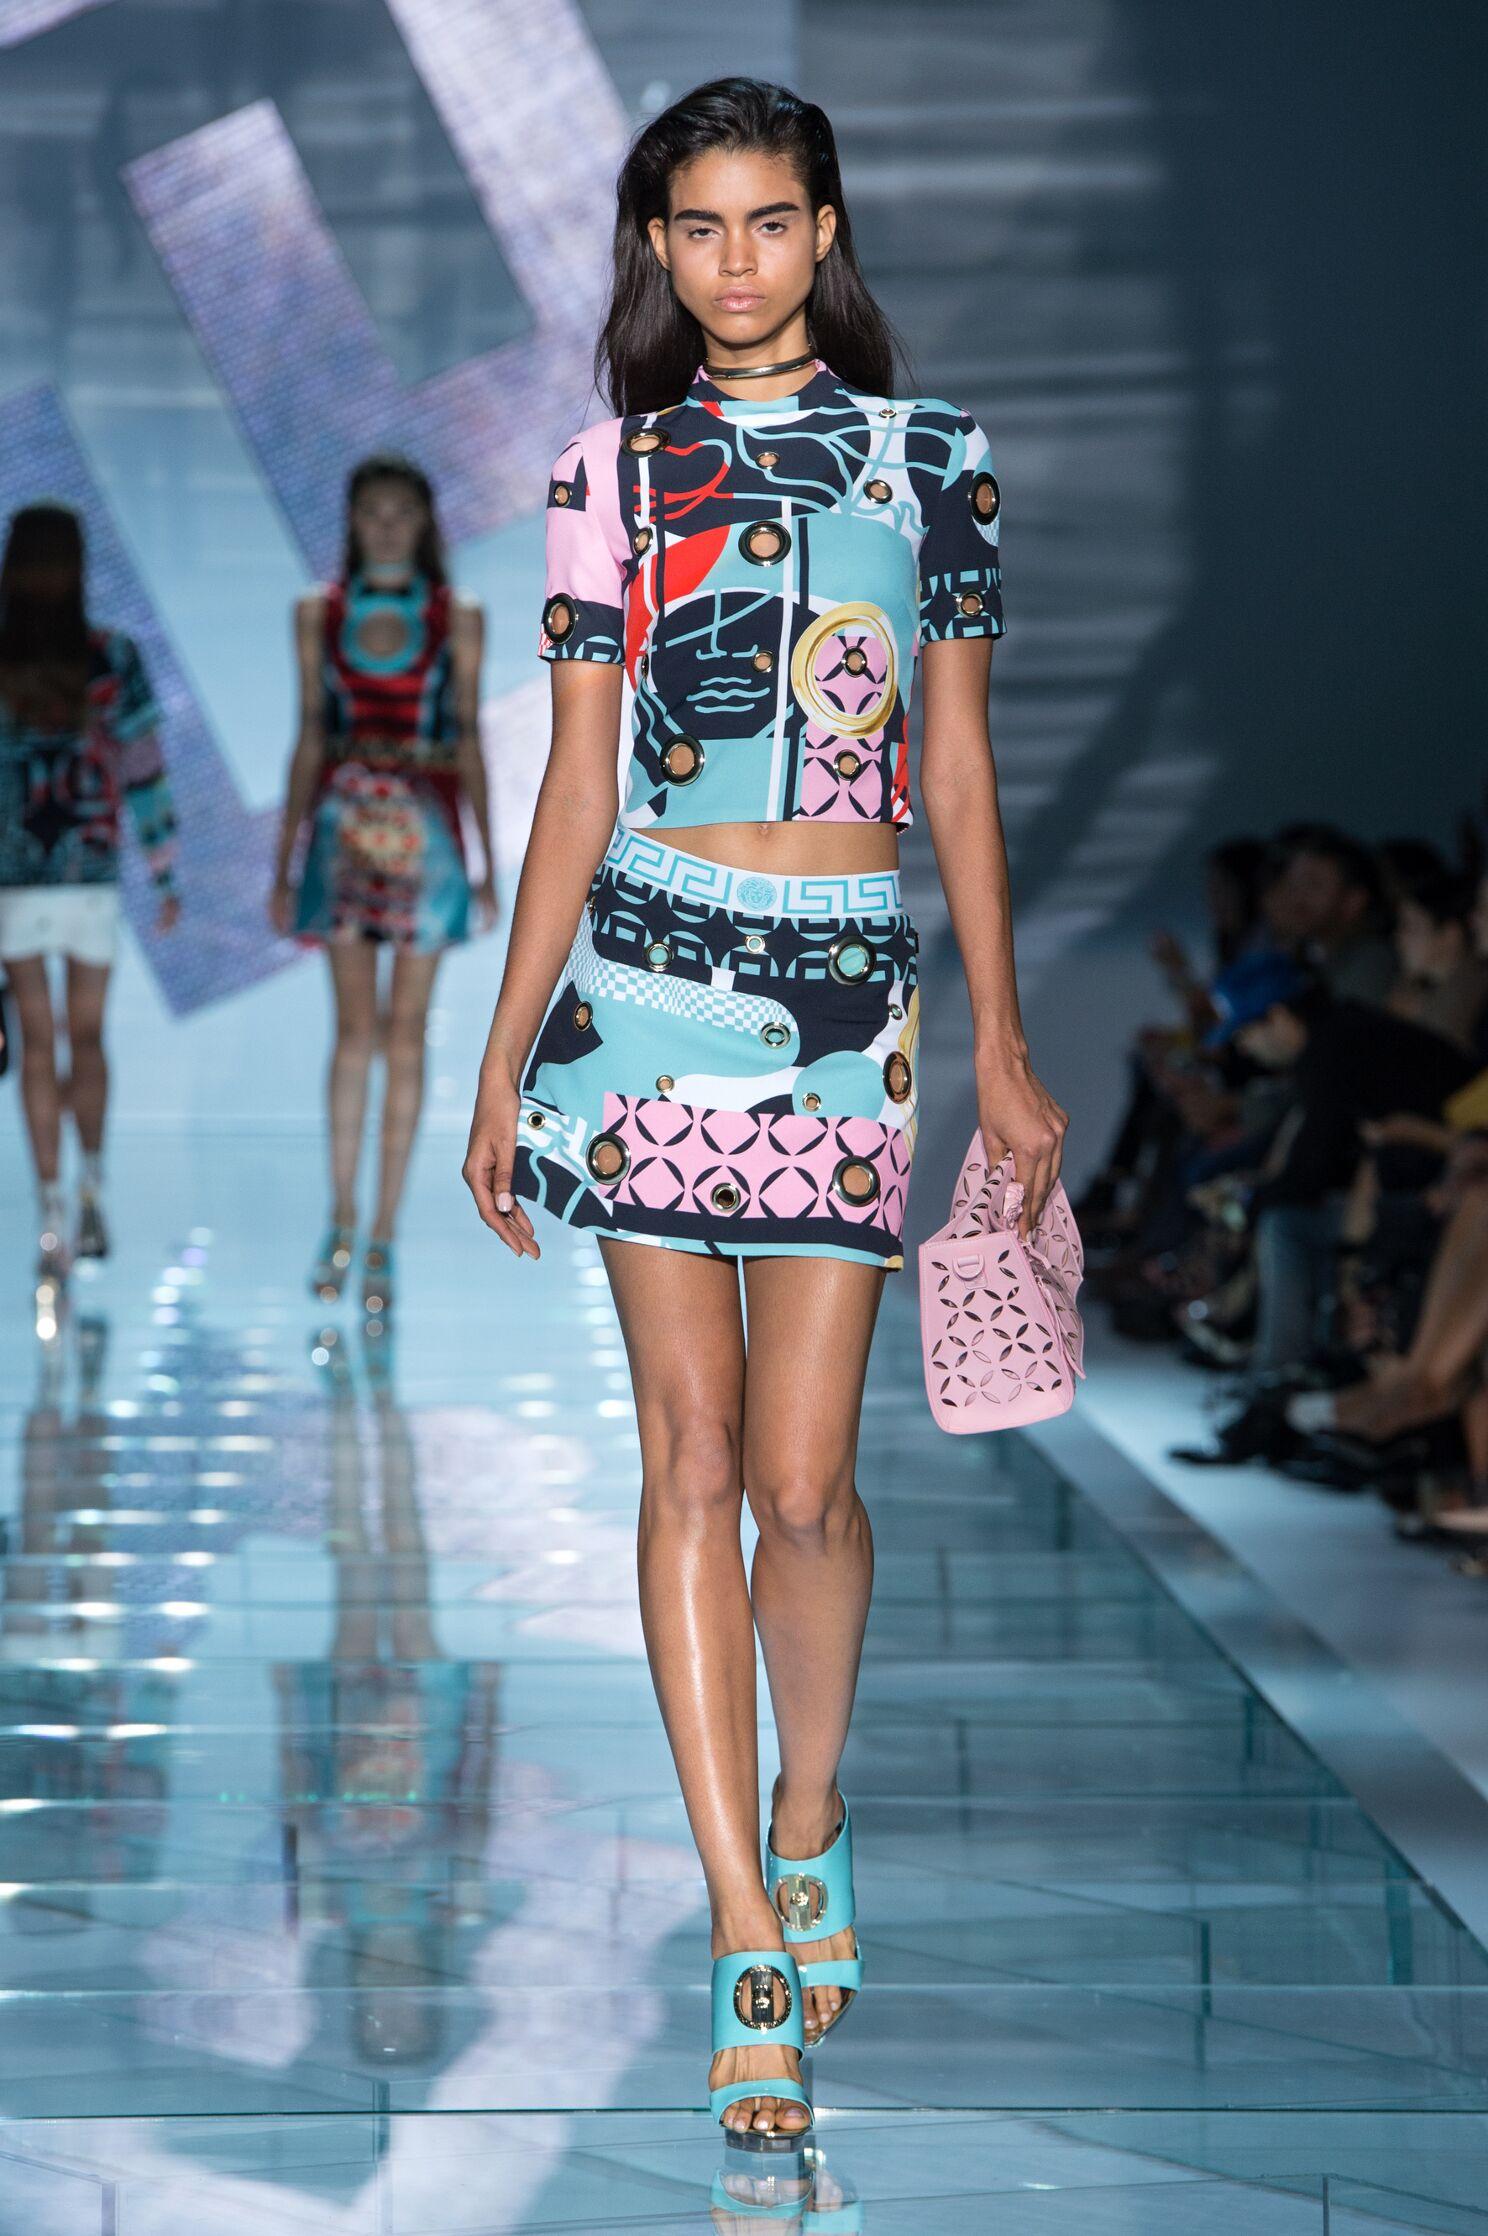 Catwalk Versace Woman Fashion Show Summer 2015